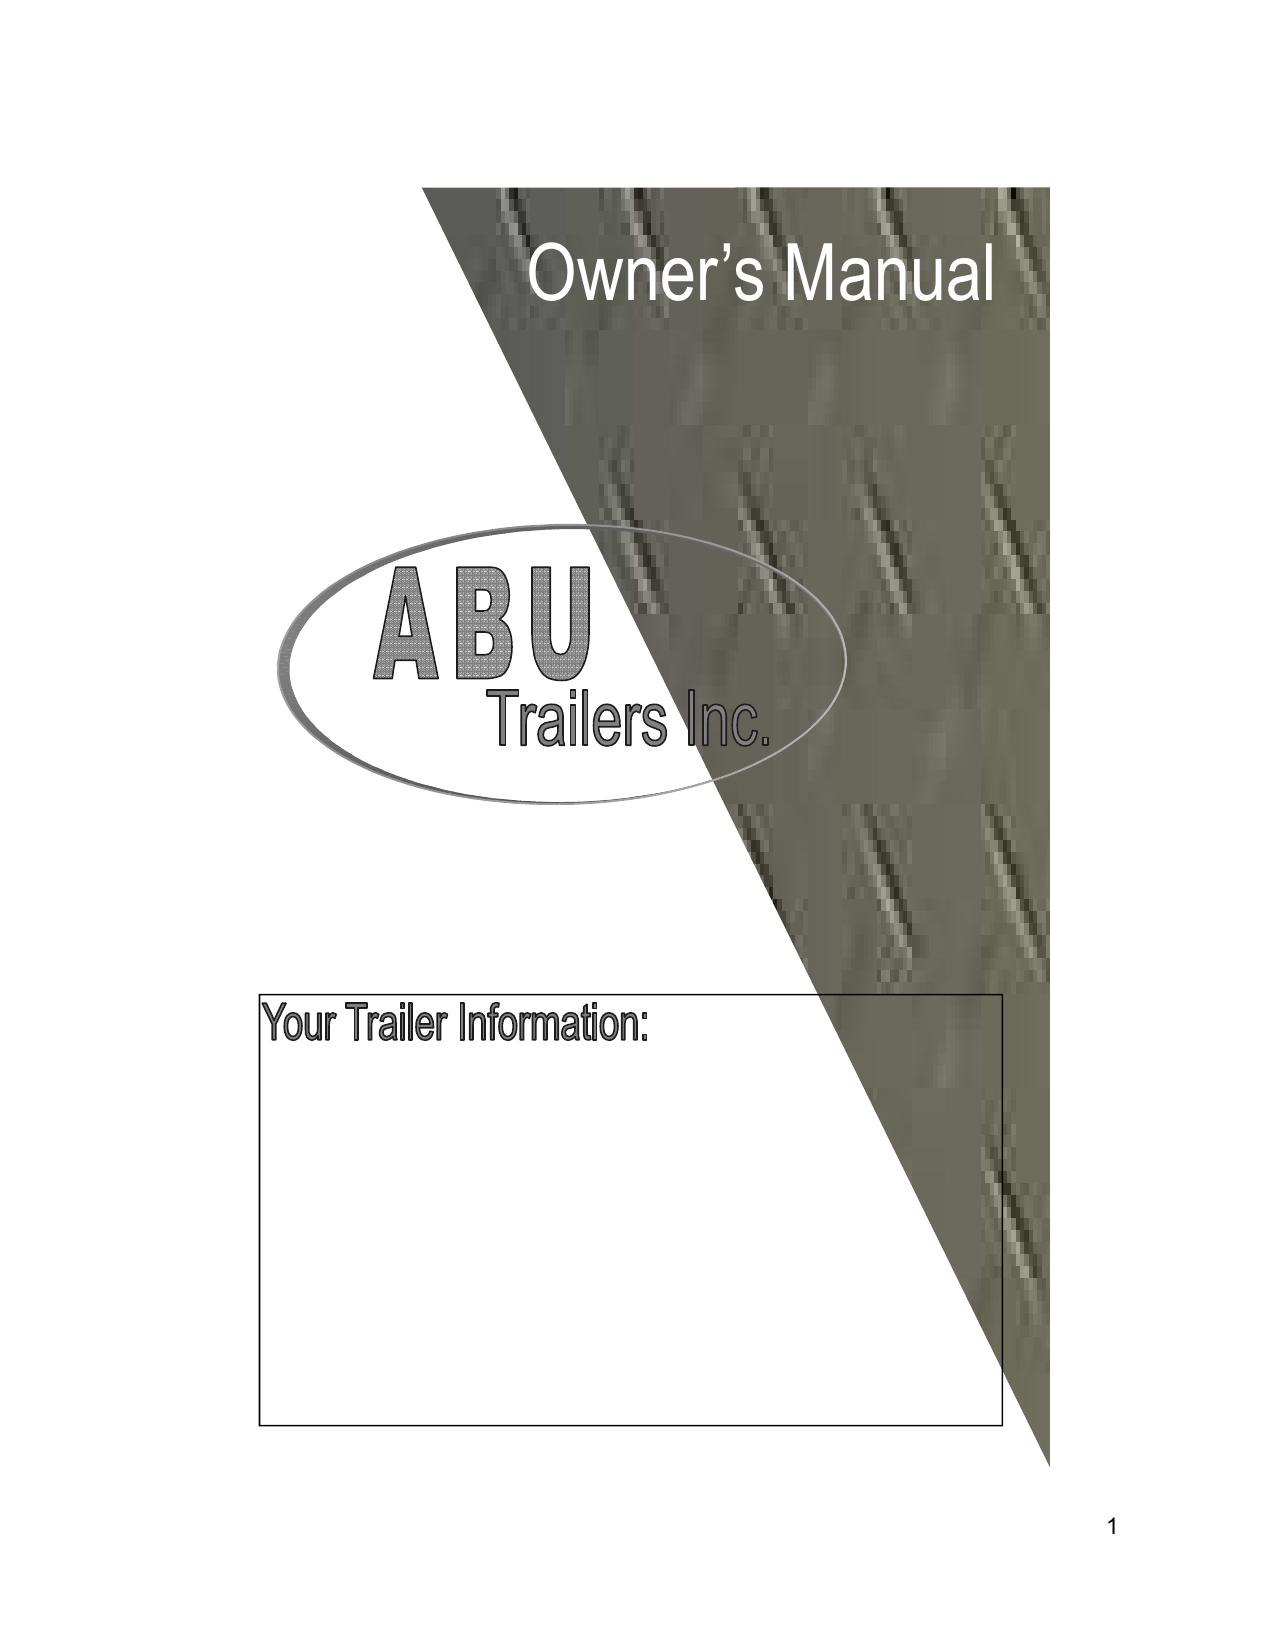 Abu Trailers Inc Owners Manual Moreover Car Hauler Trailer Plans Utility Wiring